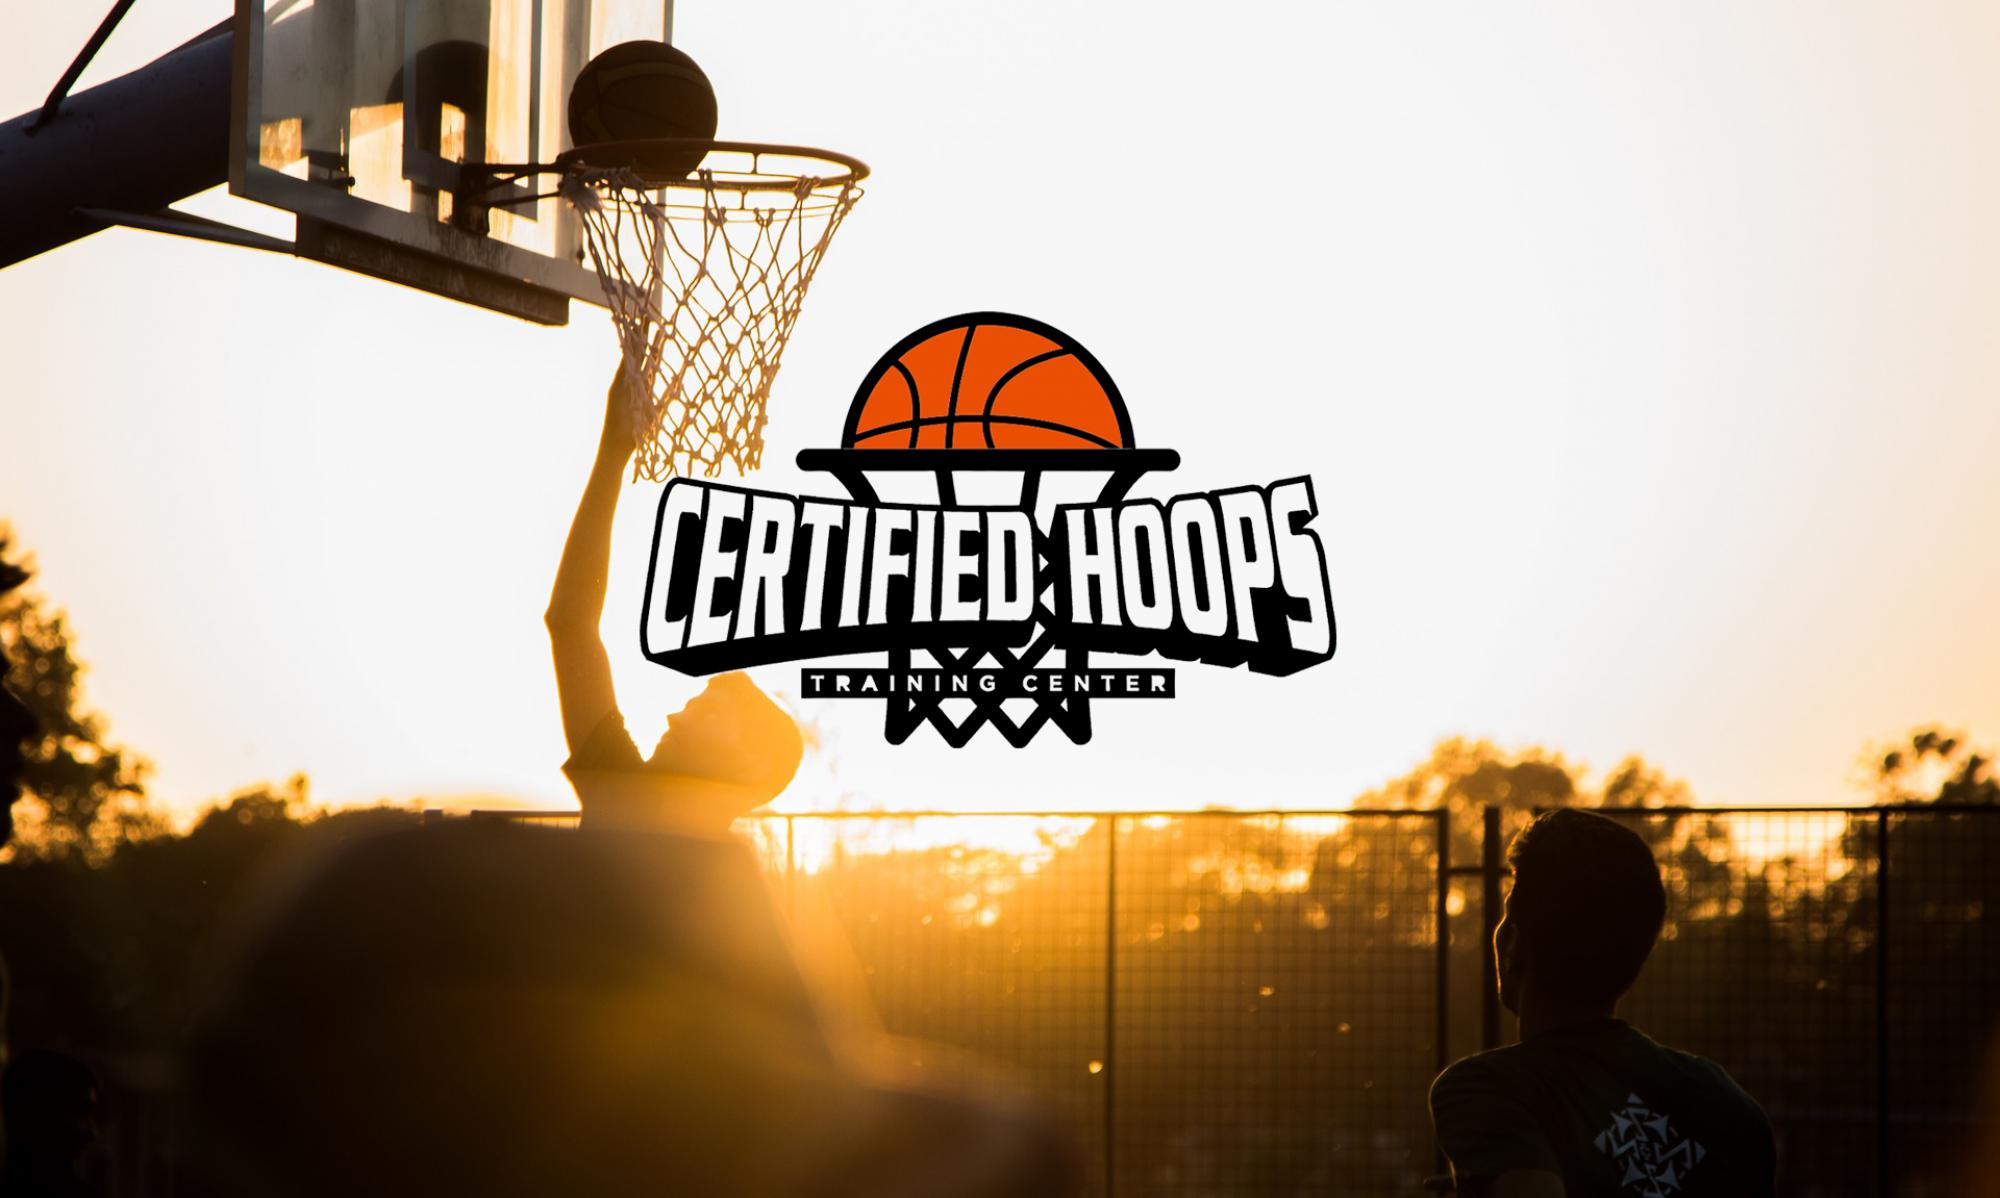 Certified Hoops